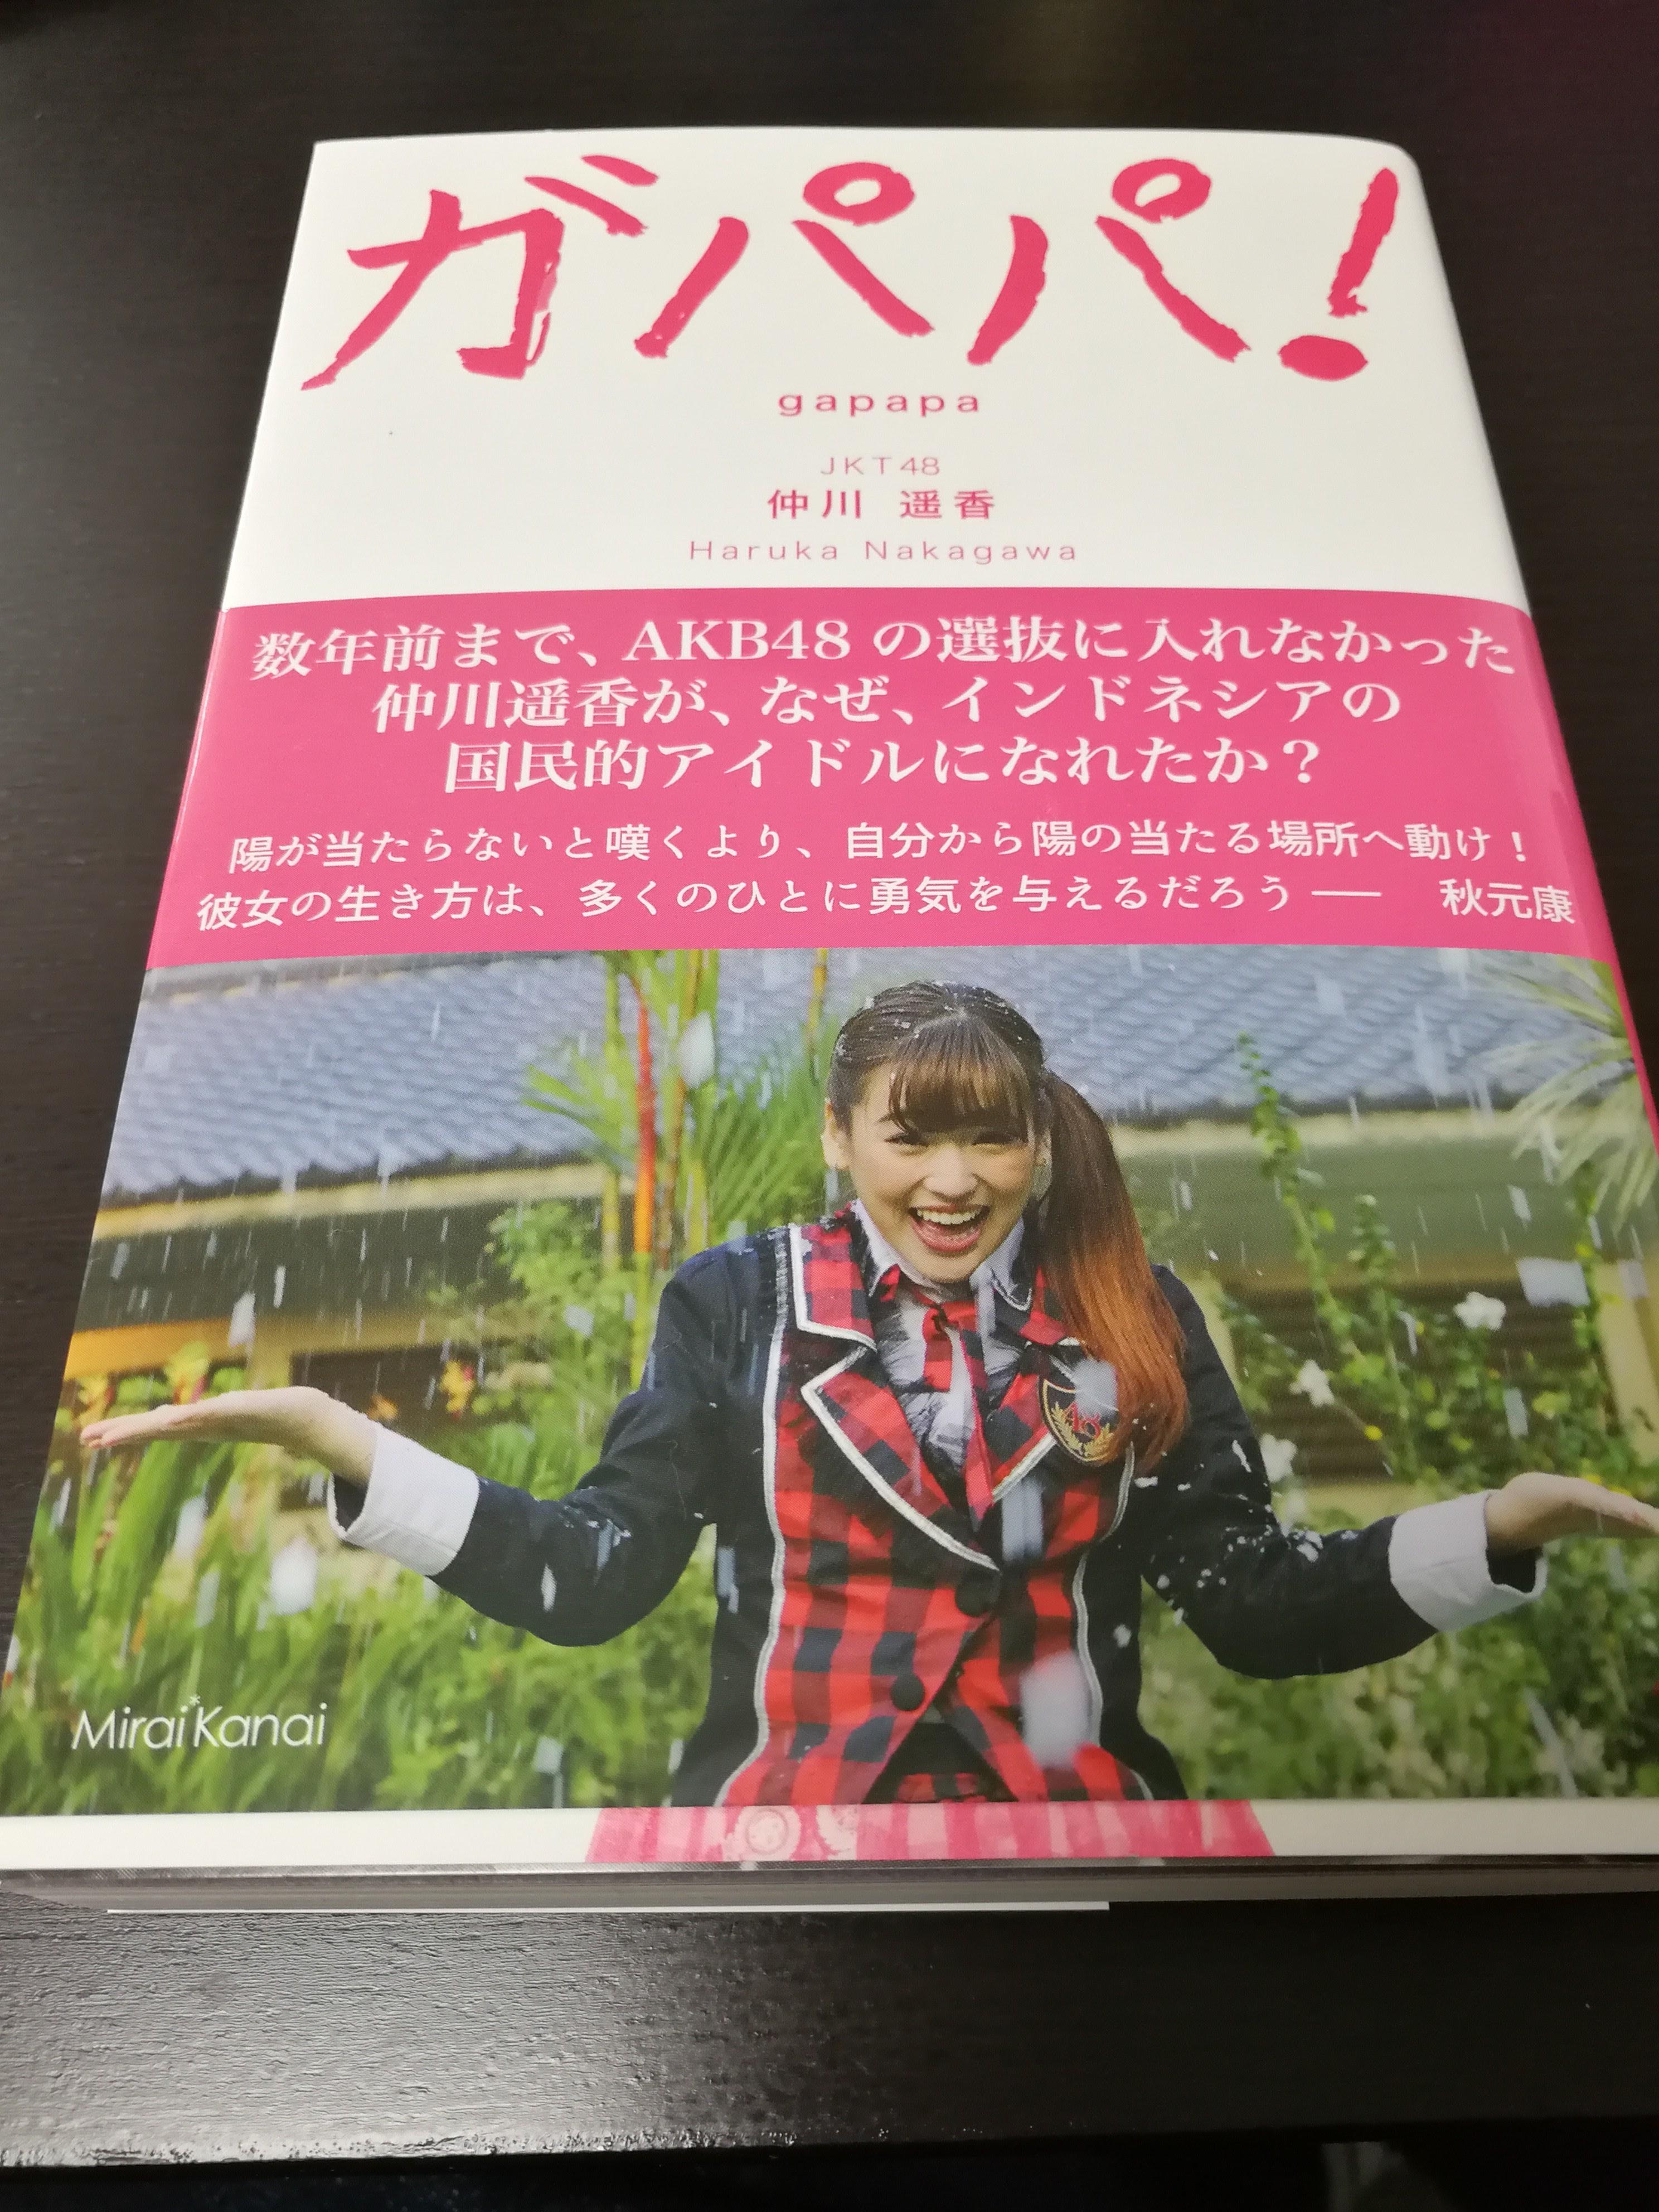 JKT48 仲川遥香 ガパパ!